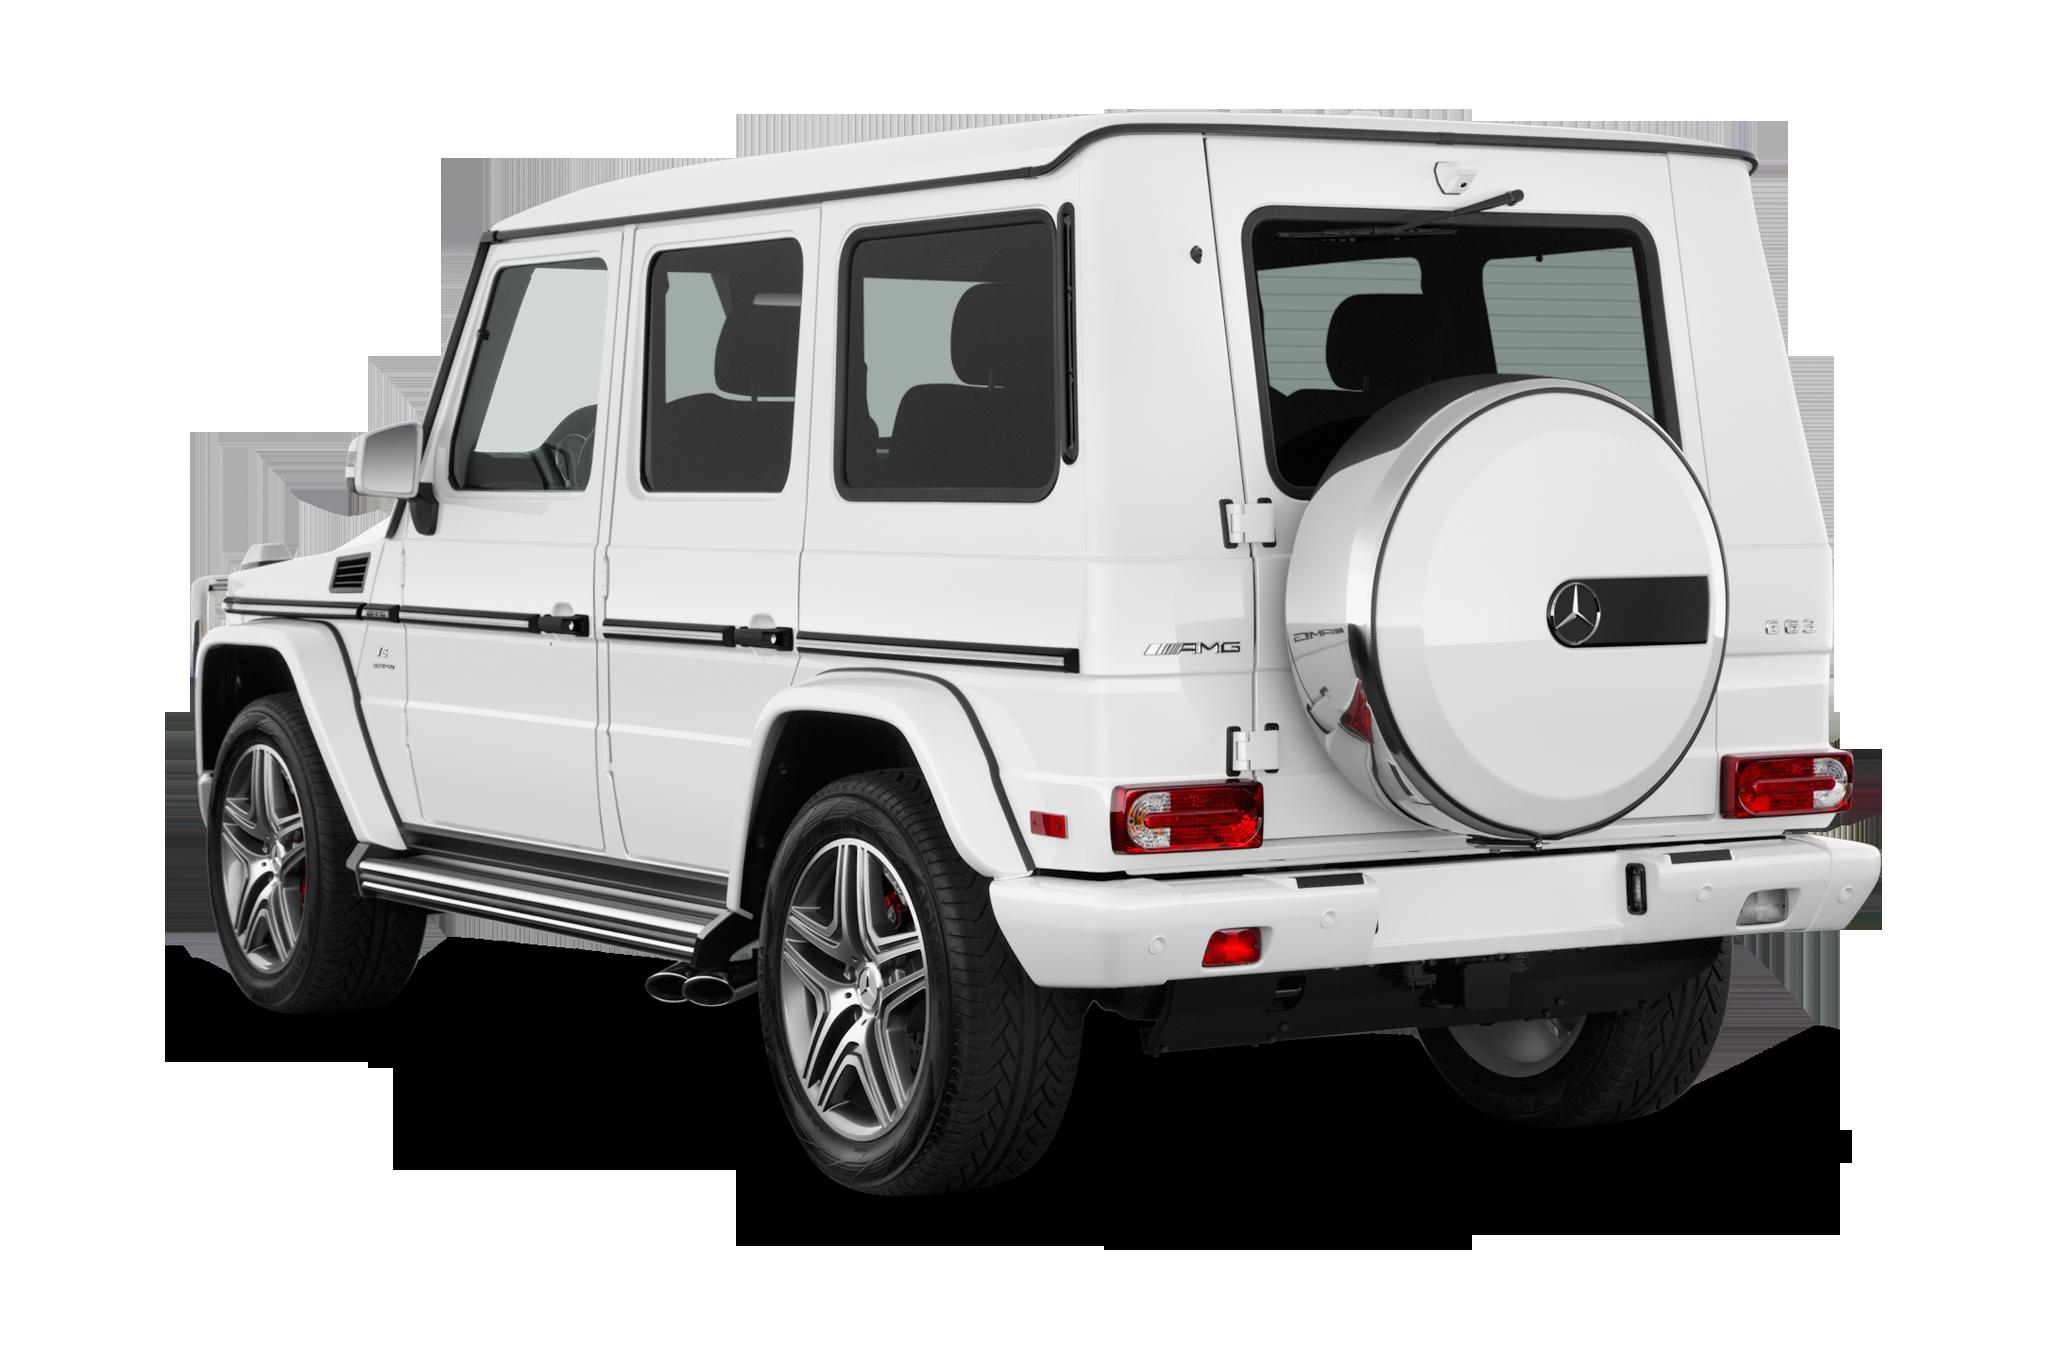 https://st.automobilemag.com/uploads/sites/10/2016/07/2016-mercedes-benz-g-class-amg-g63-suv-angular-rear.png